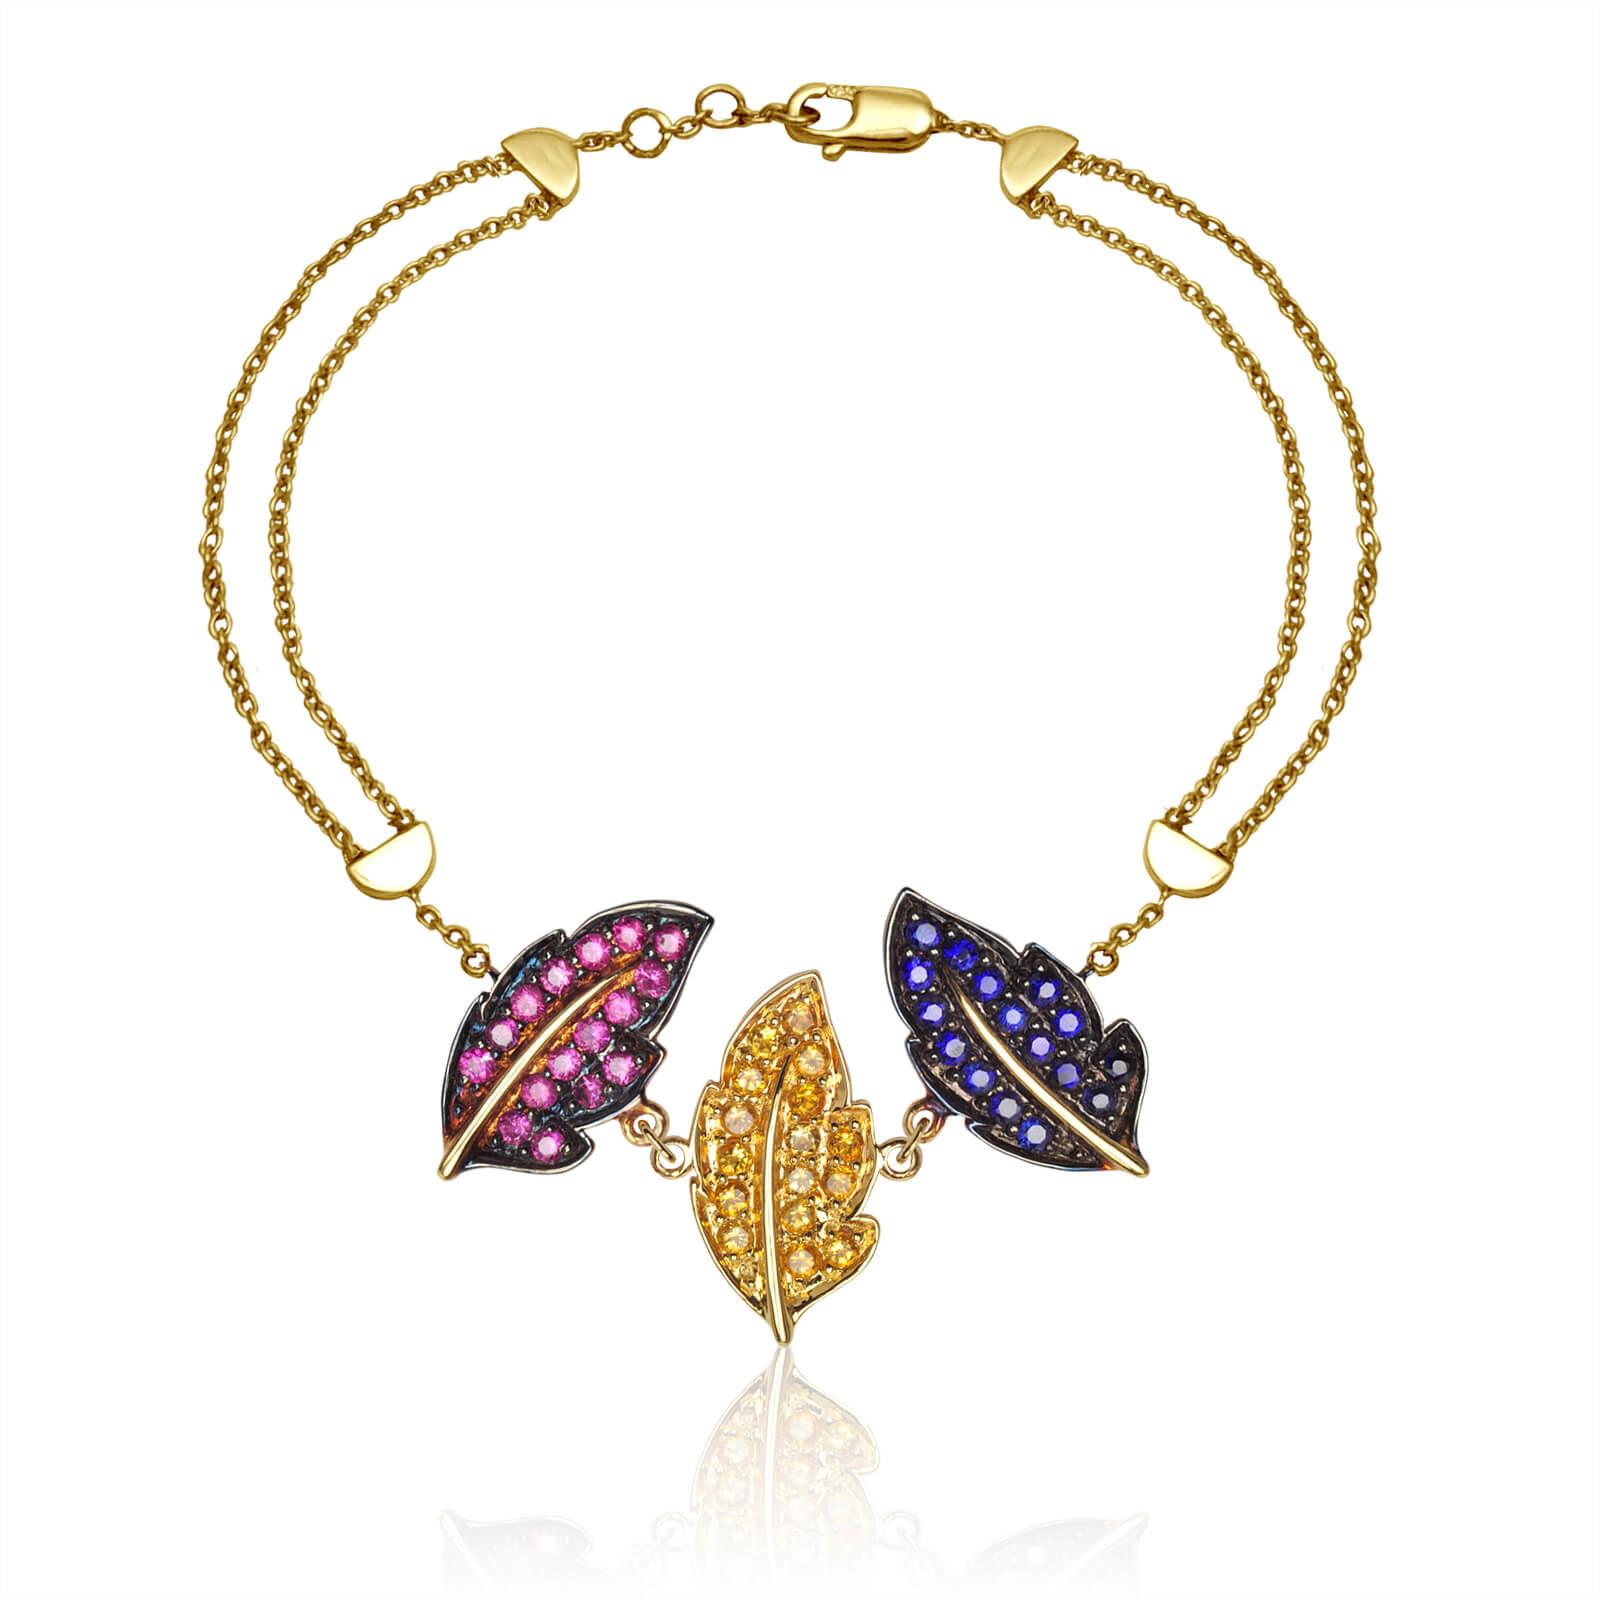 cbr033cls-bracelet-feuilles-dautomne